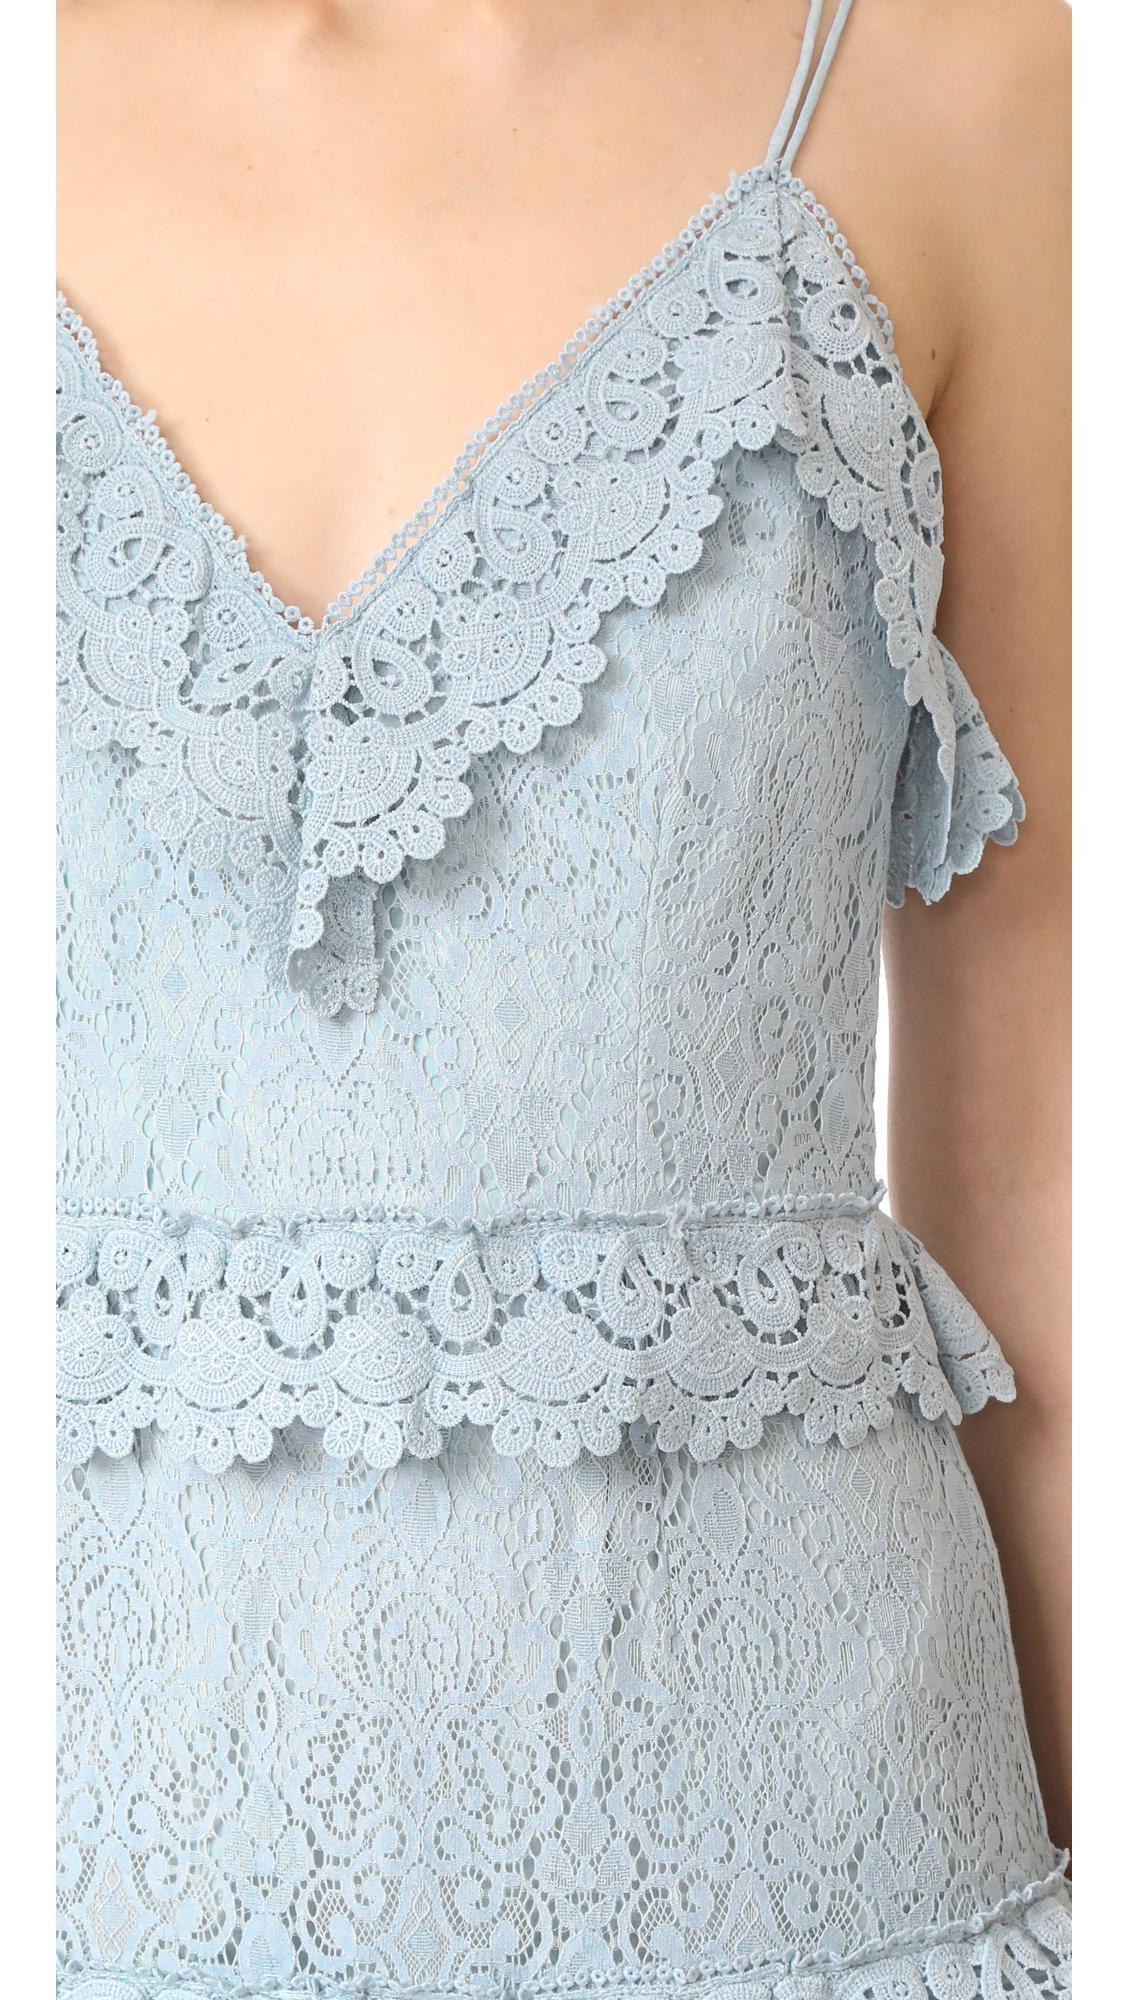 2739c9b49884 Lyst - Talulah Shadow Dance Crossover Mini Dress in Blue